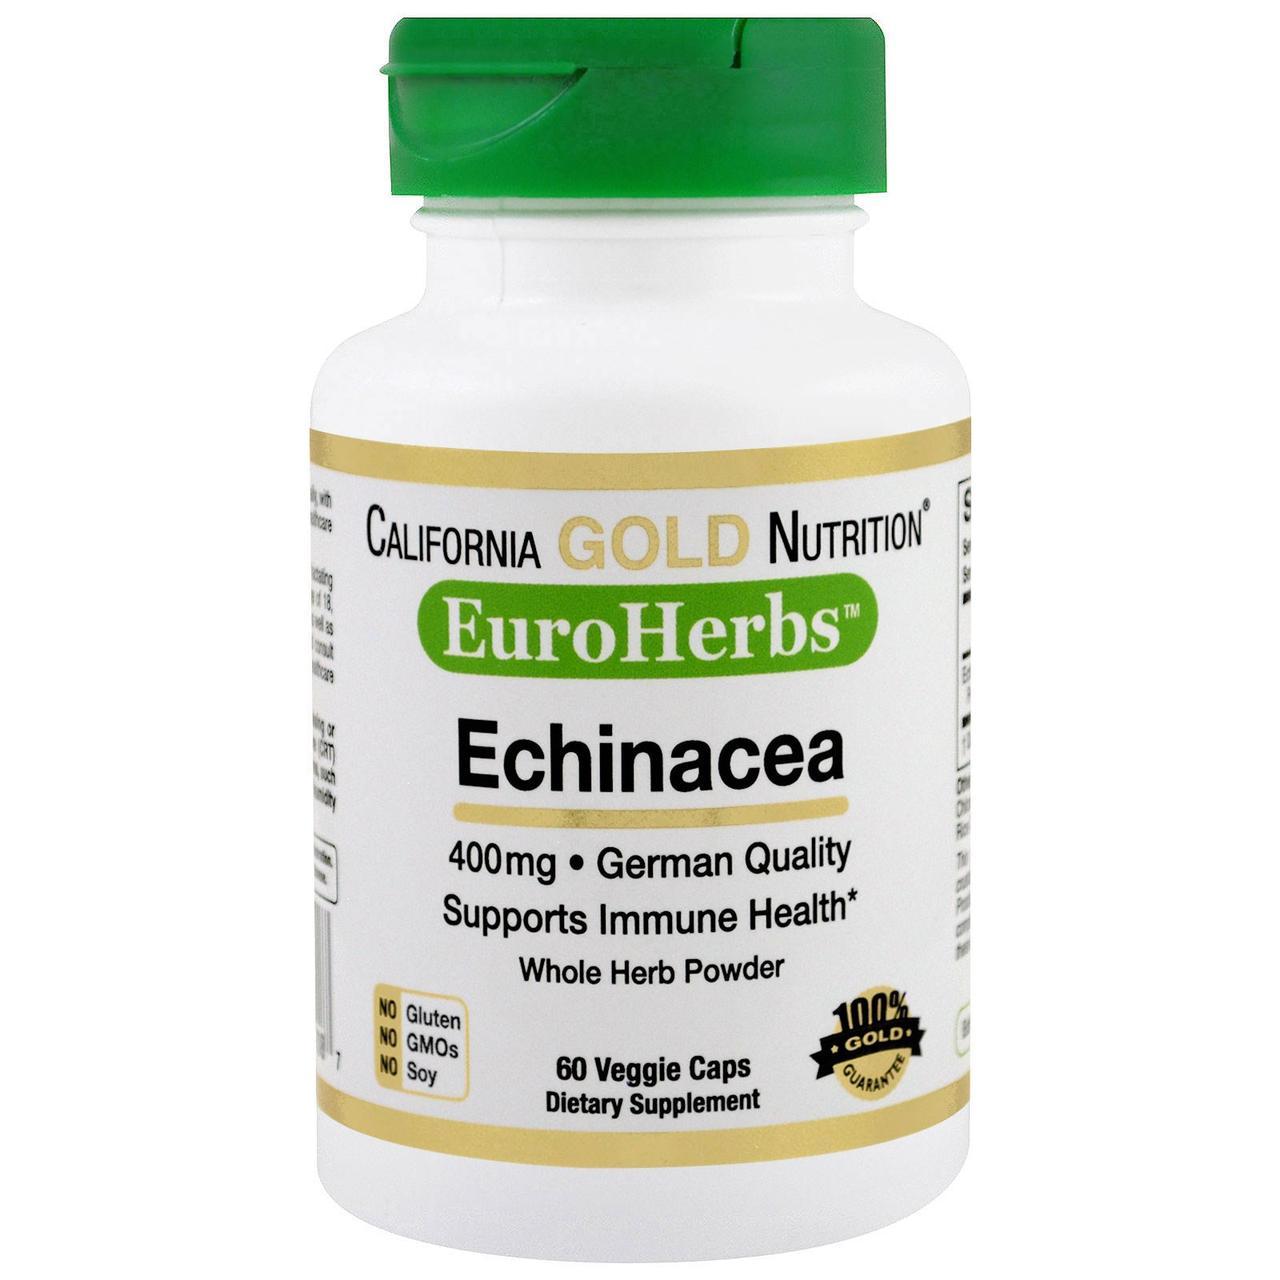 California Gold Nutrition, EuroHerbs, Эхинацея PWD 400 mg, VC MB, 60 карат